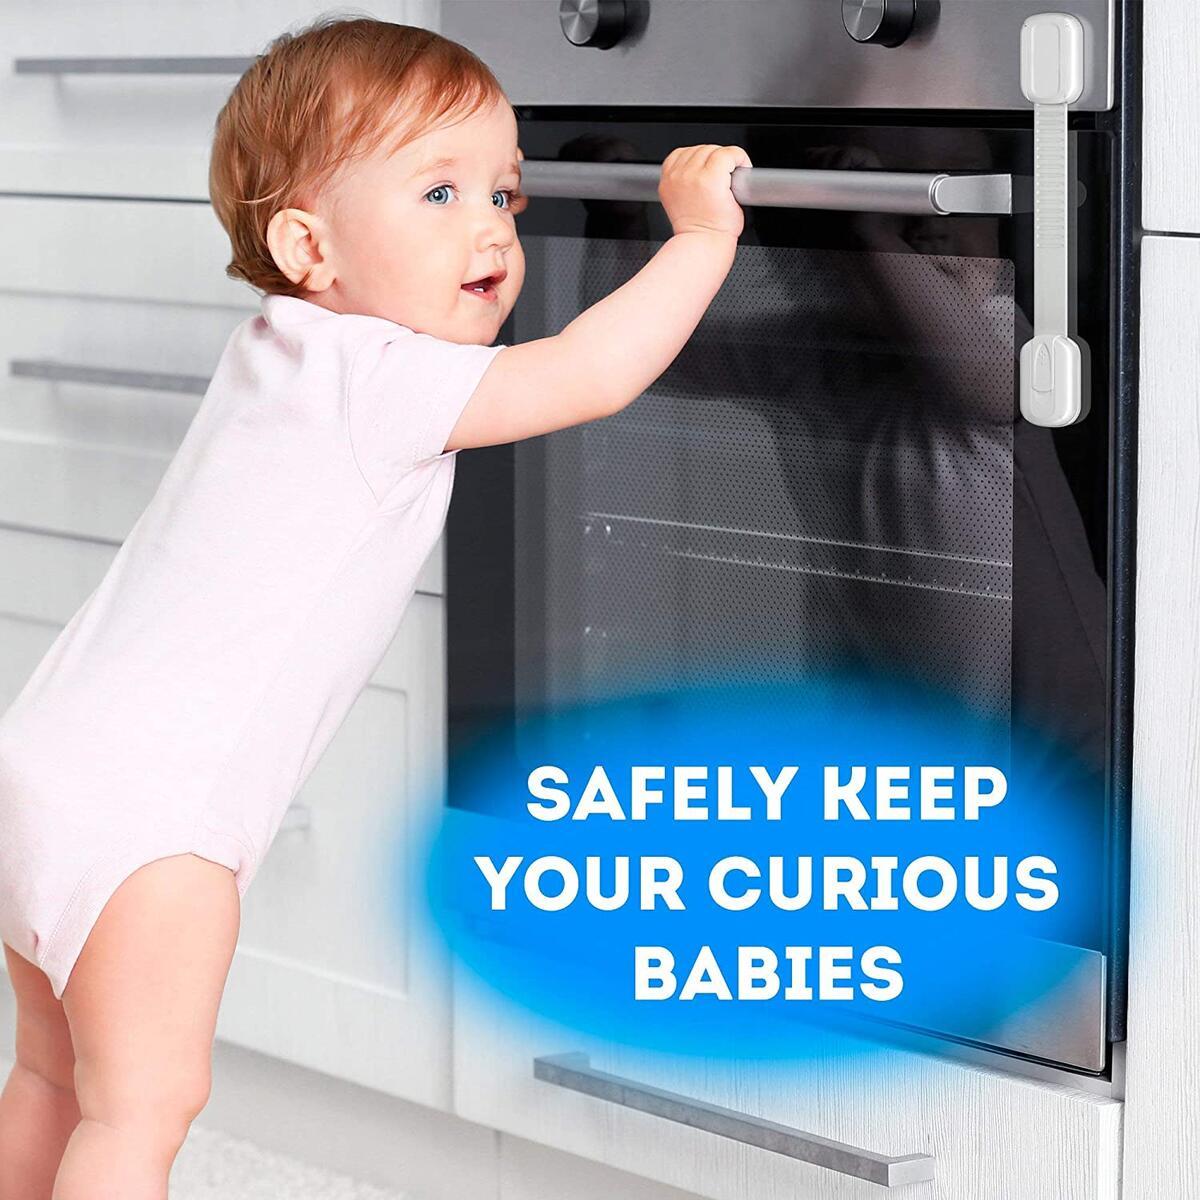 Multipurpose Baby Safety Cabinet Lock Latch Kit - 6 PACK Adjustable Locks + 4 Corner Guards Set - Cupboard Lock Child Safety - Durable Baby Proofing Drawer Locks - Oven Fridge Toilet Seat Kids Proof